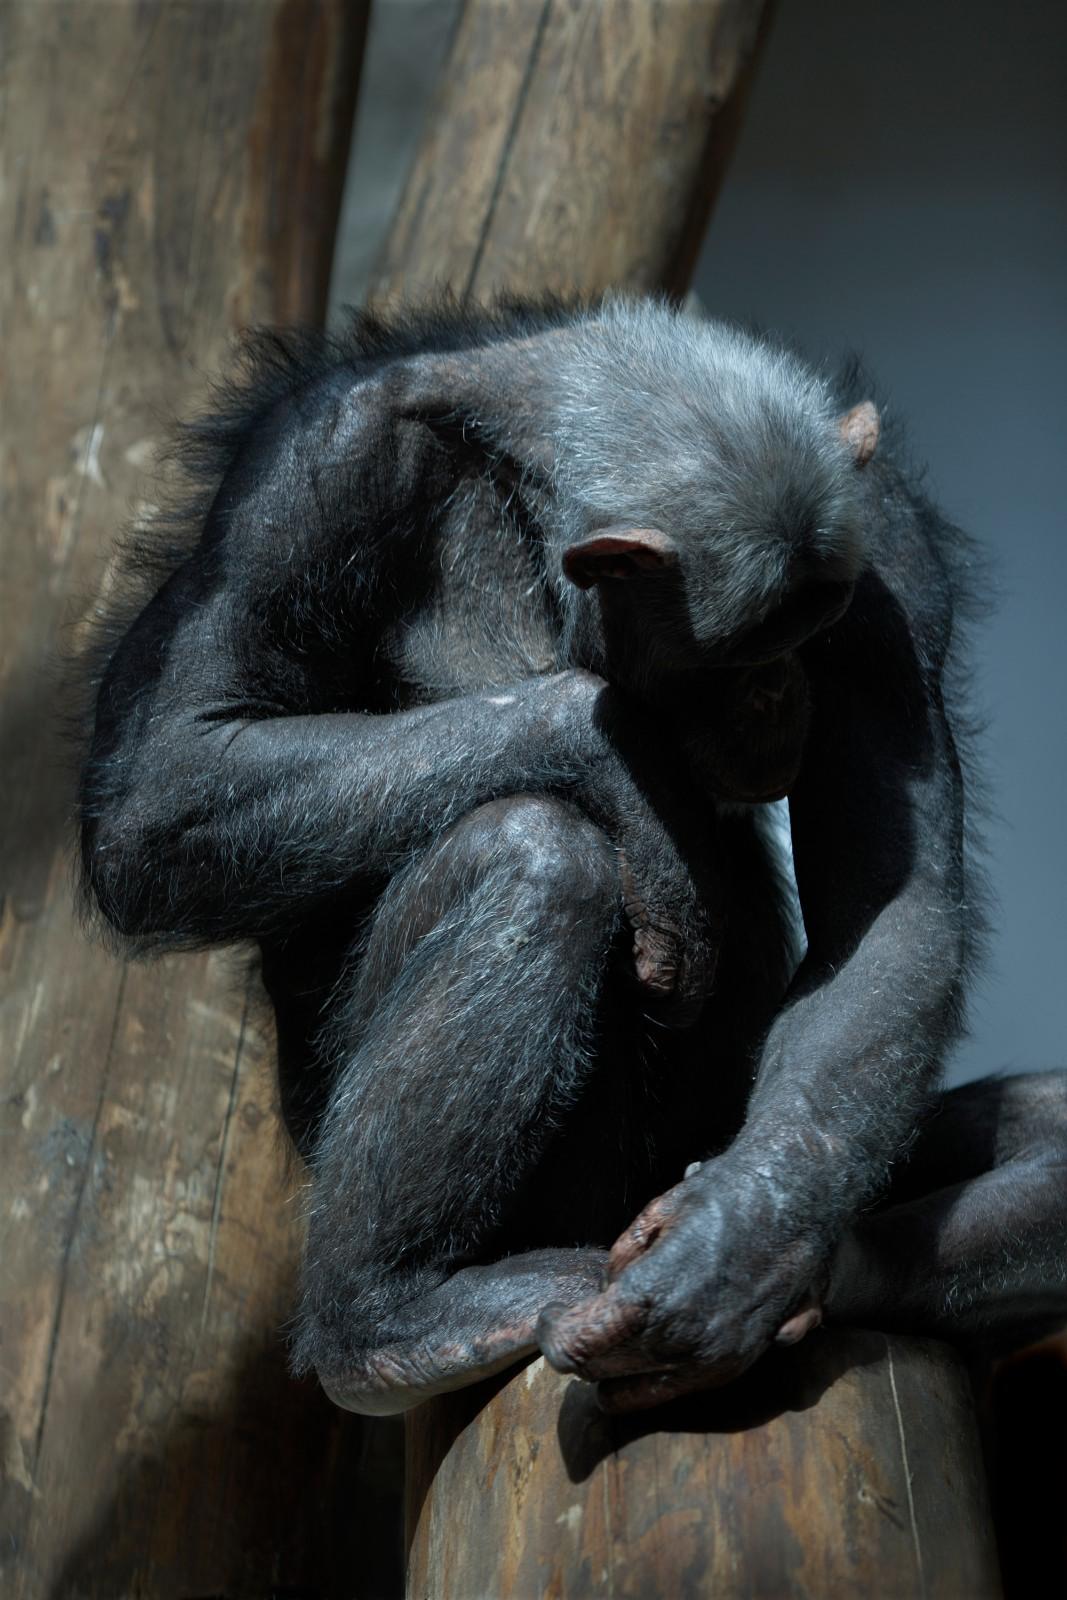 monkey-like, 2010, giclée print mounted on aluminum, 93,3 x 61,3 cm, ed. 5